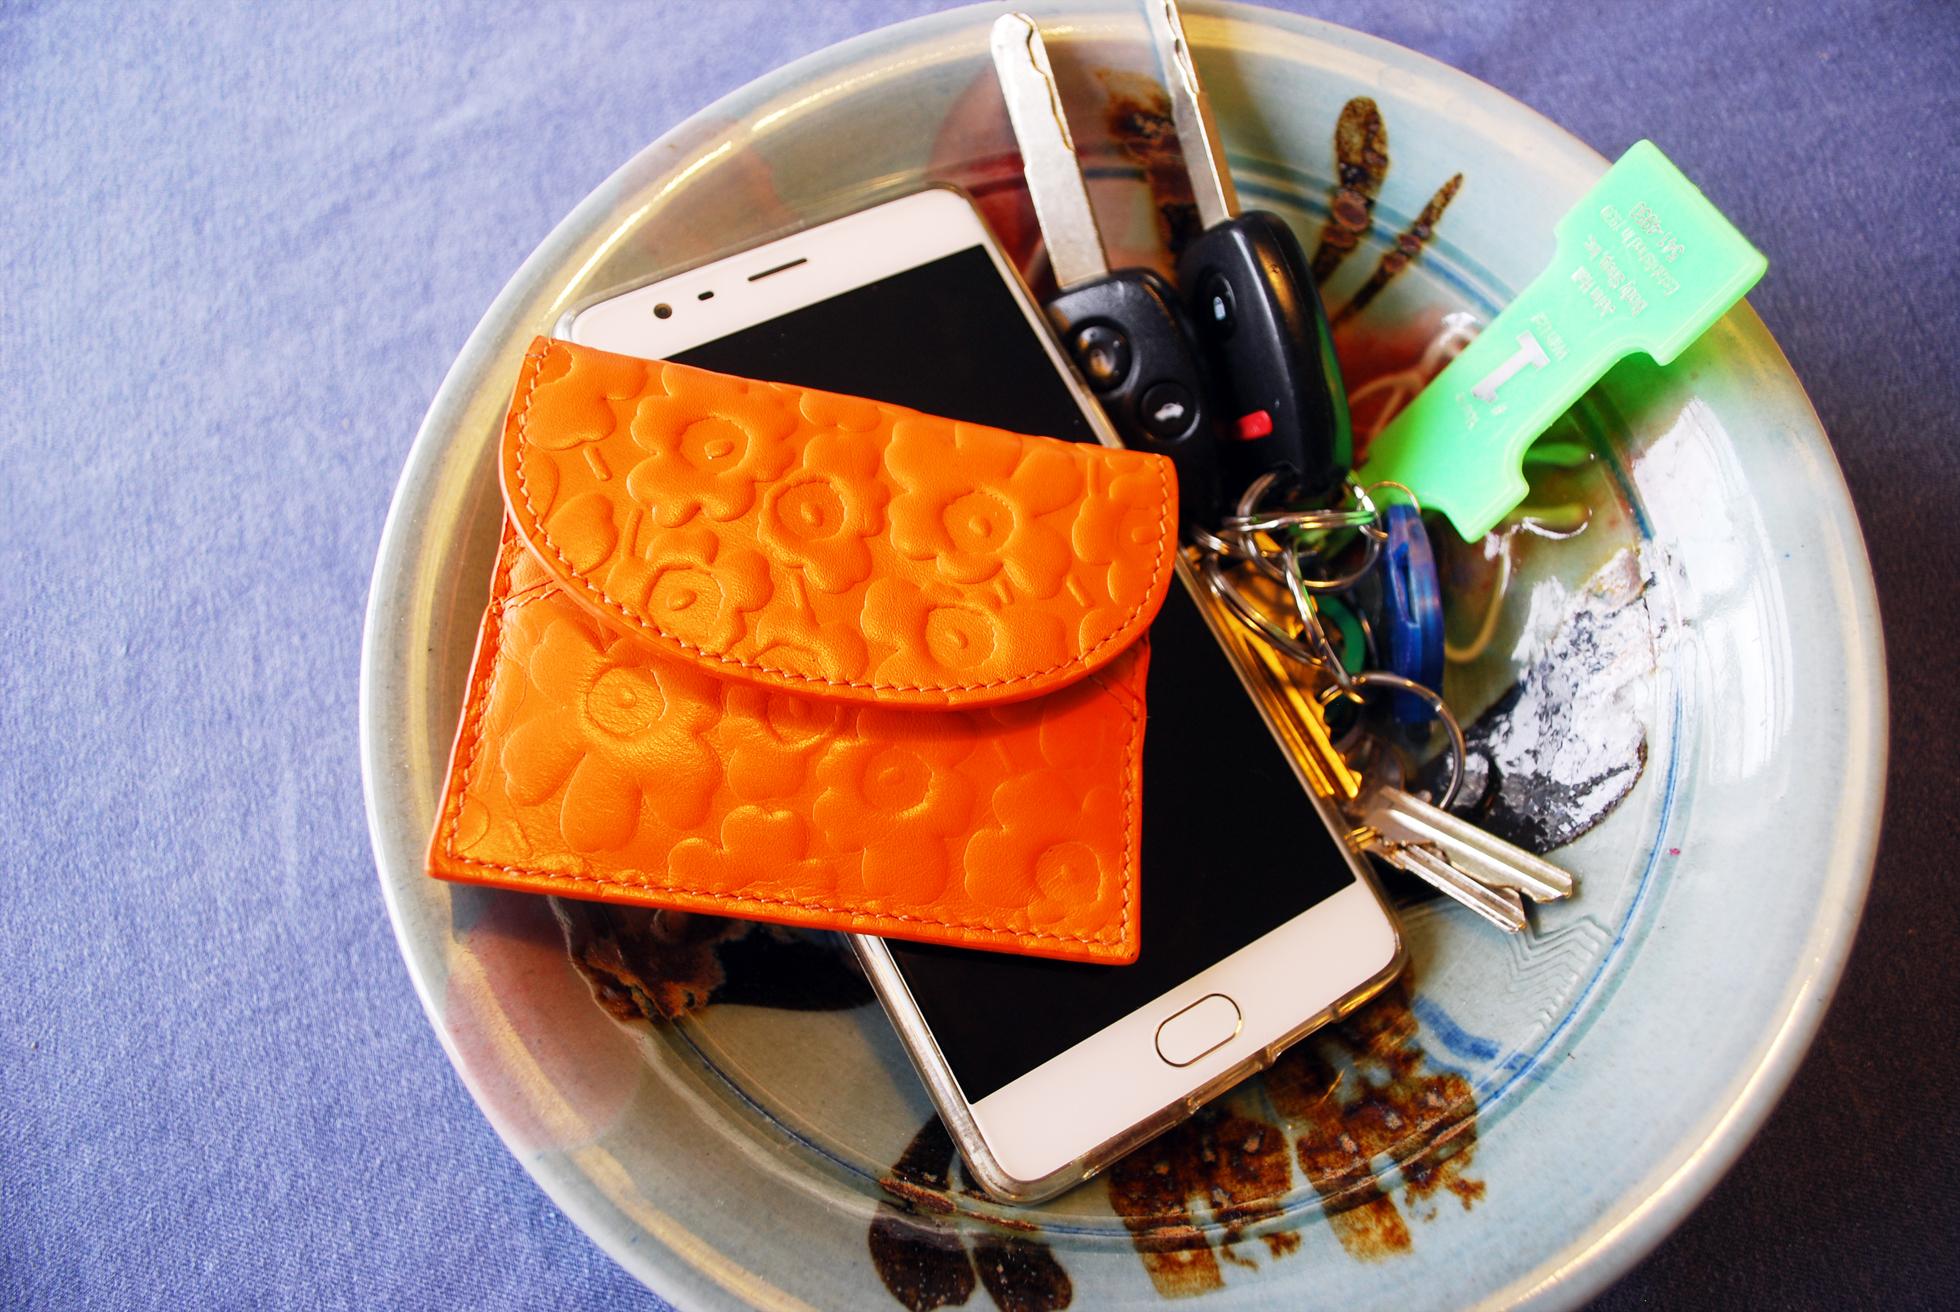 how-keep-organized-home-keys-wallet-retina_retina_7618b43c696a7177cf4f5380fb0ce71a.jpg